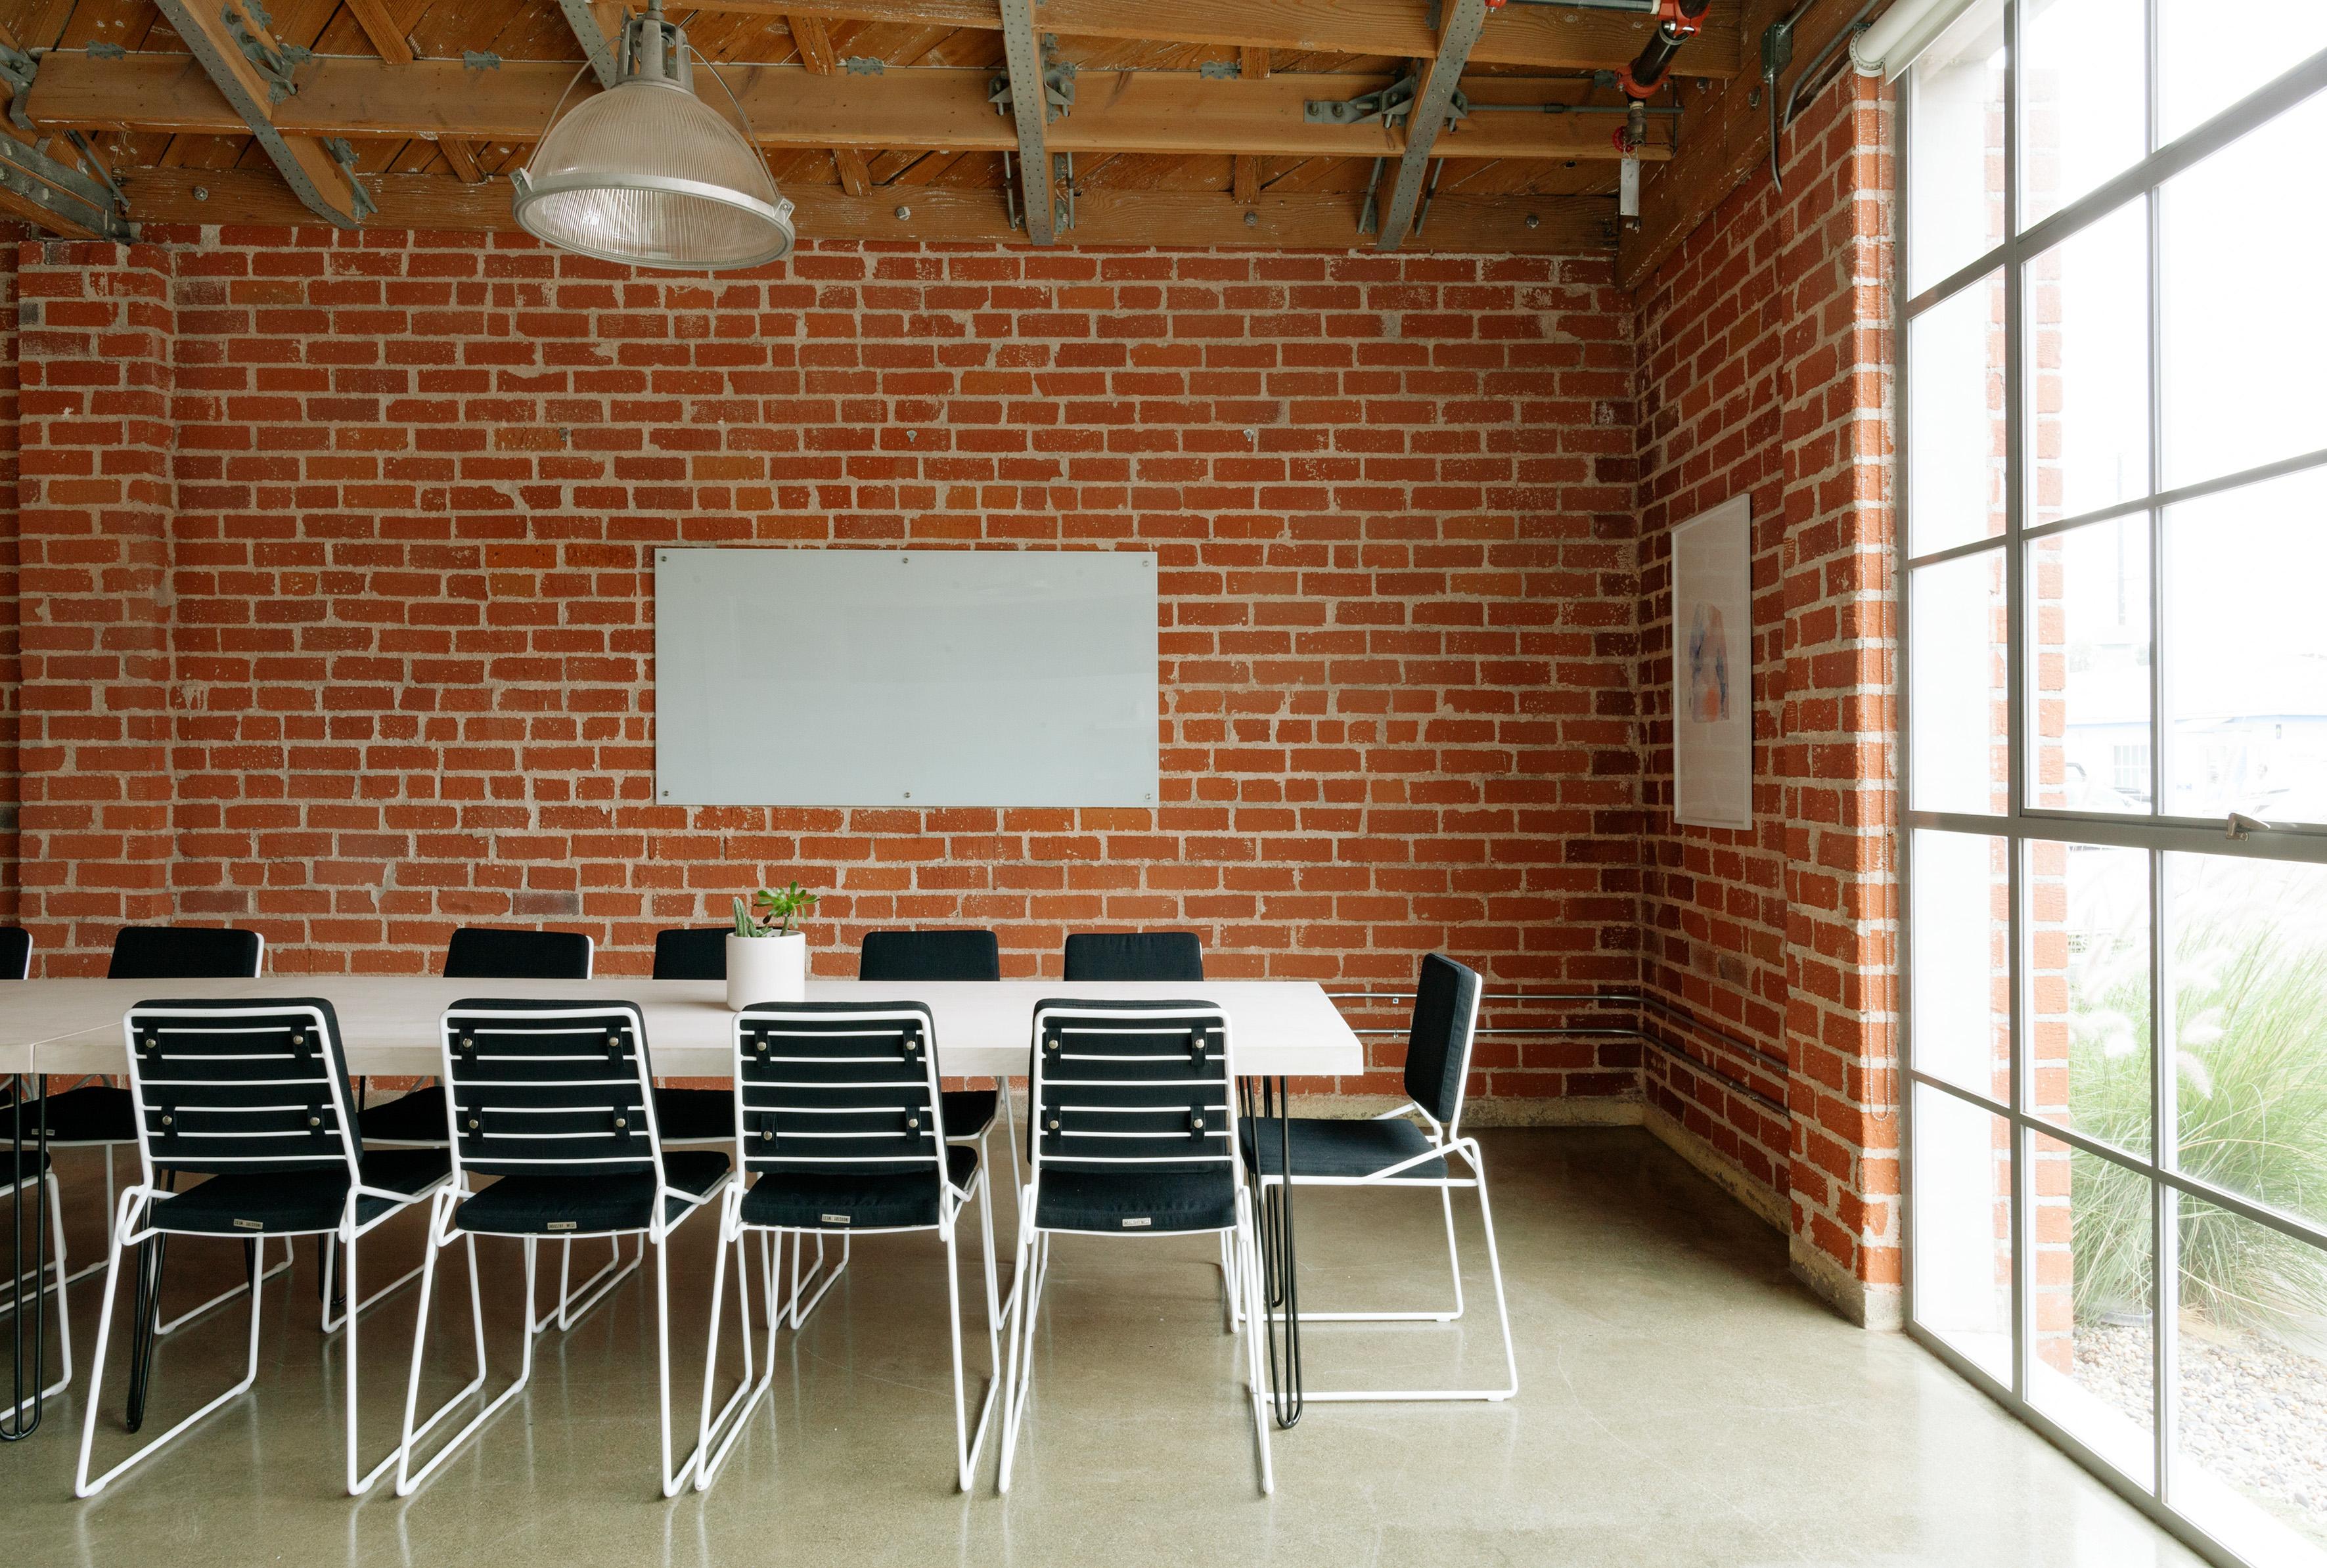 Free Images : auditorium, chair, floor, wall, office, indoor ...